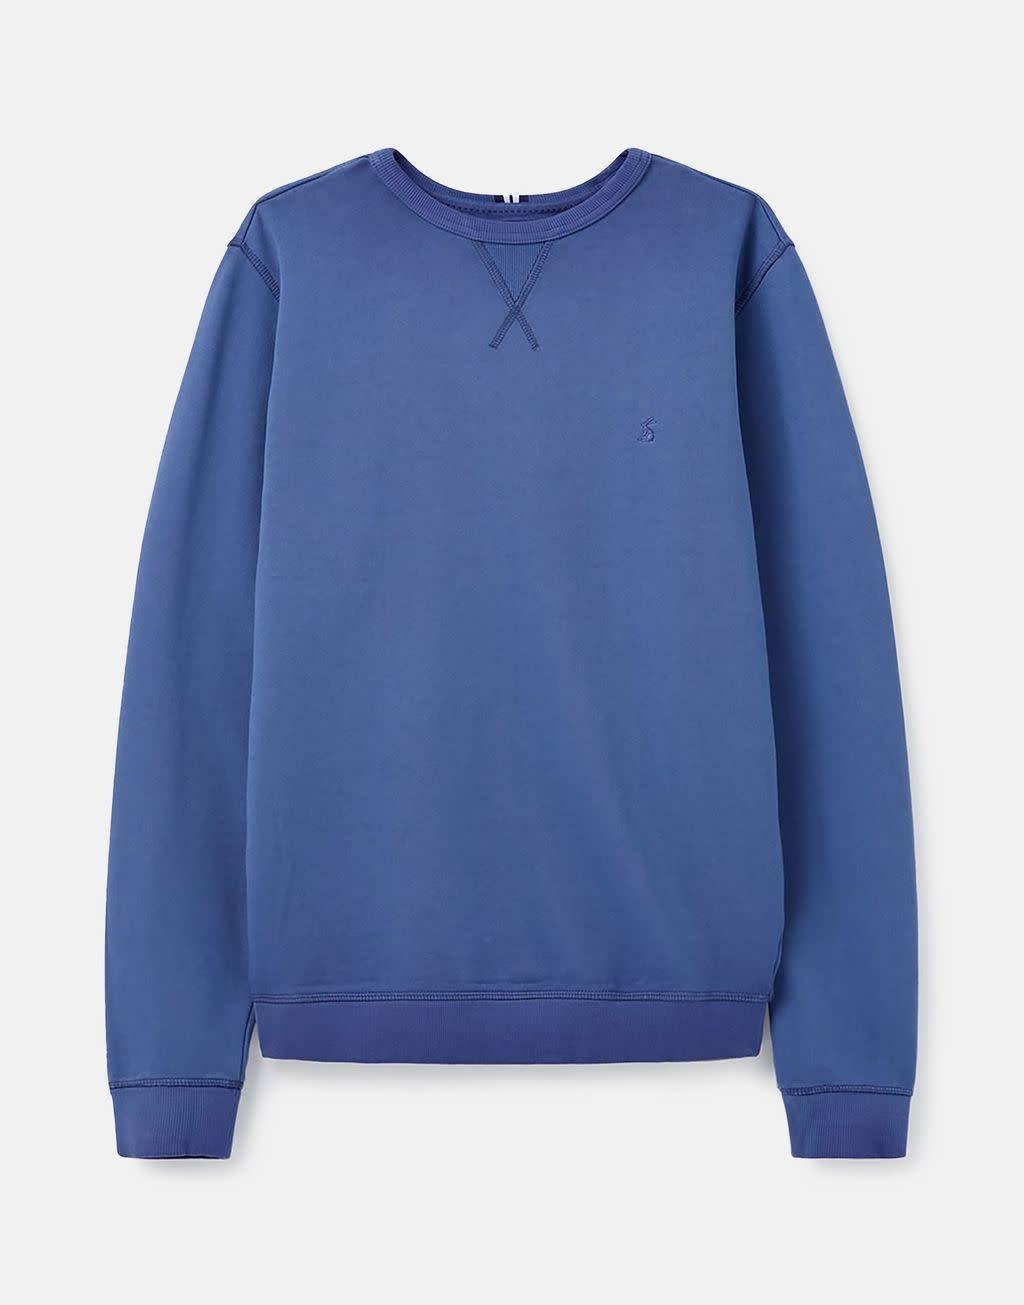 Joules Monty Dye Crew Sweatshirt